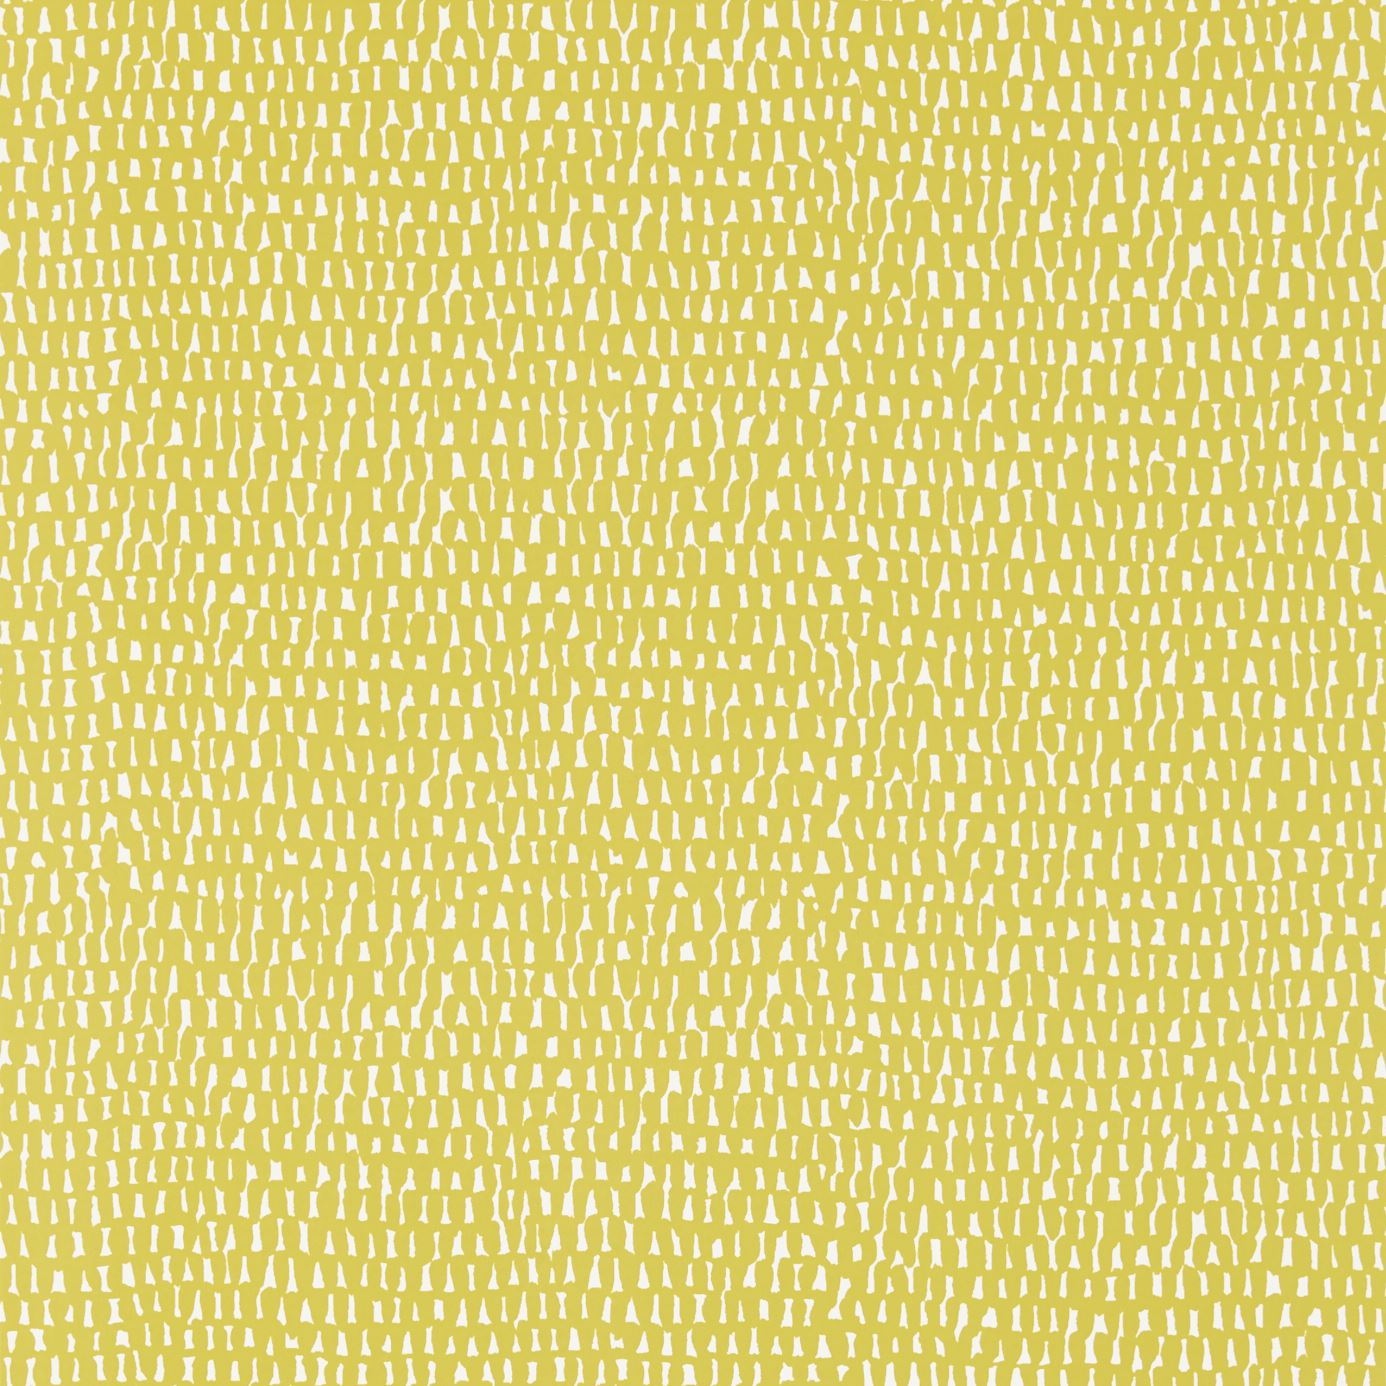 Английские обои Scion,  коллекция Guess Who, артикул111274